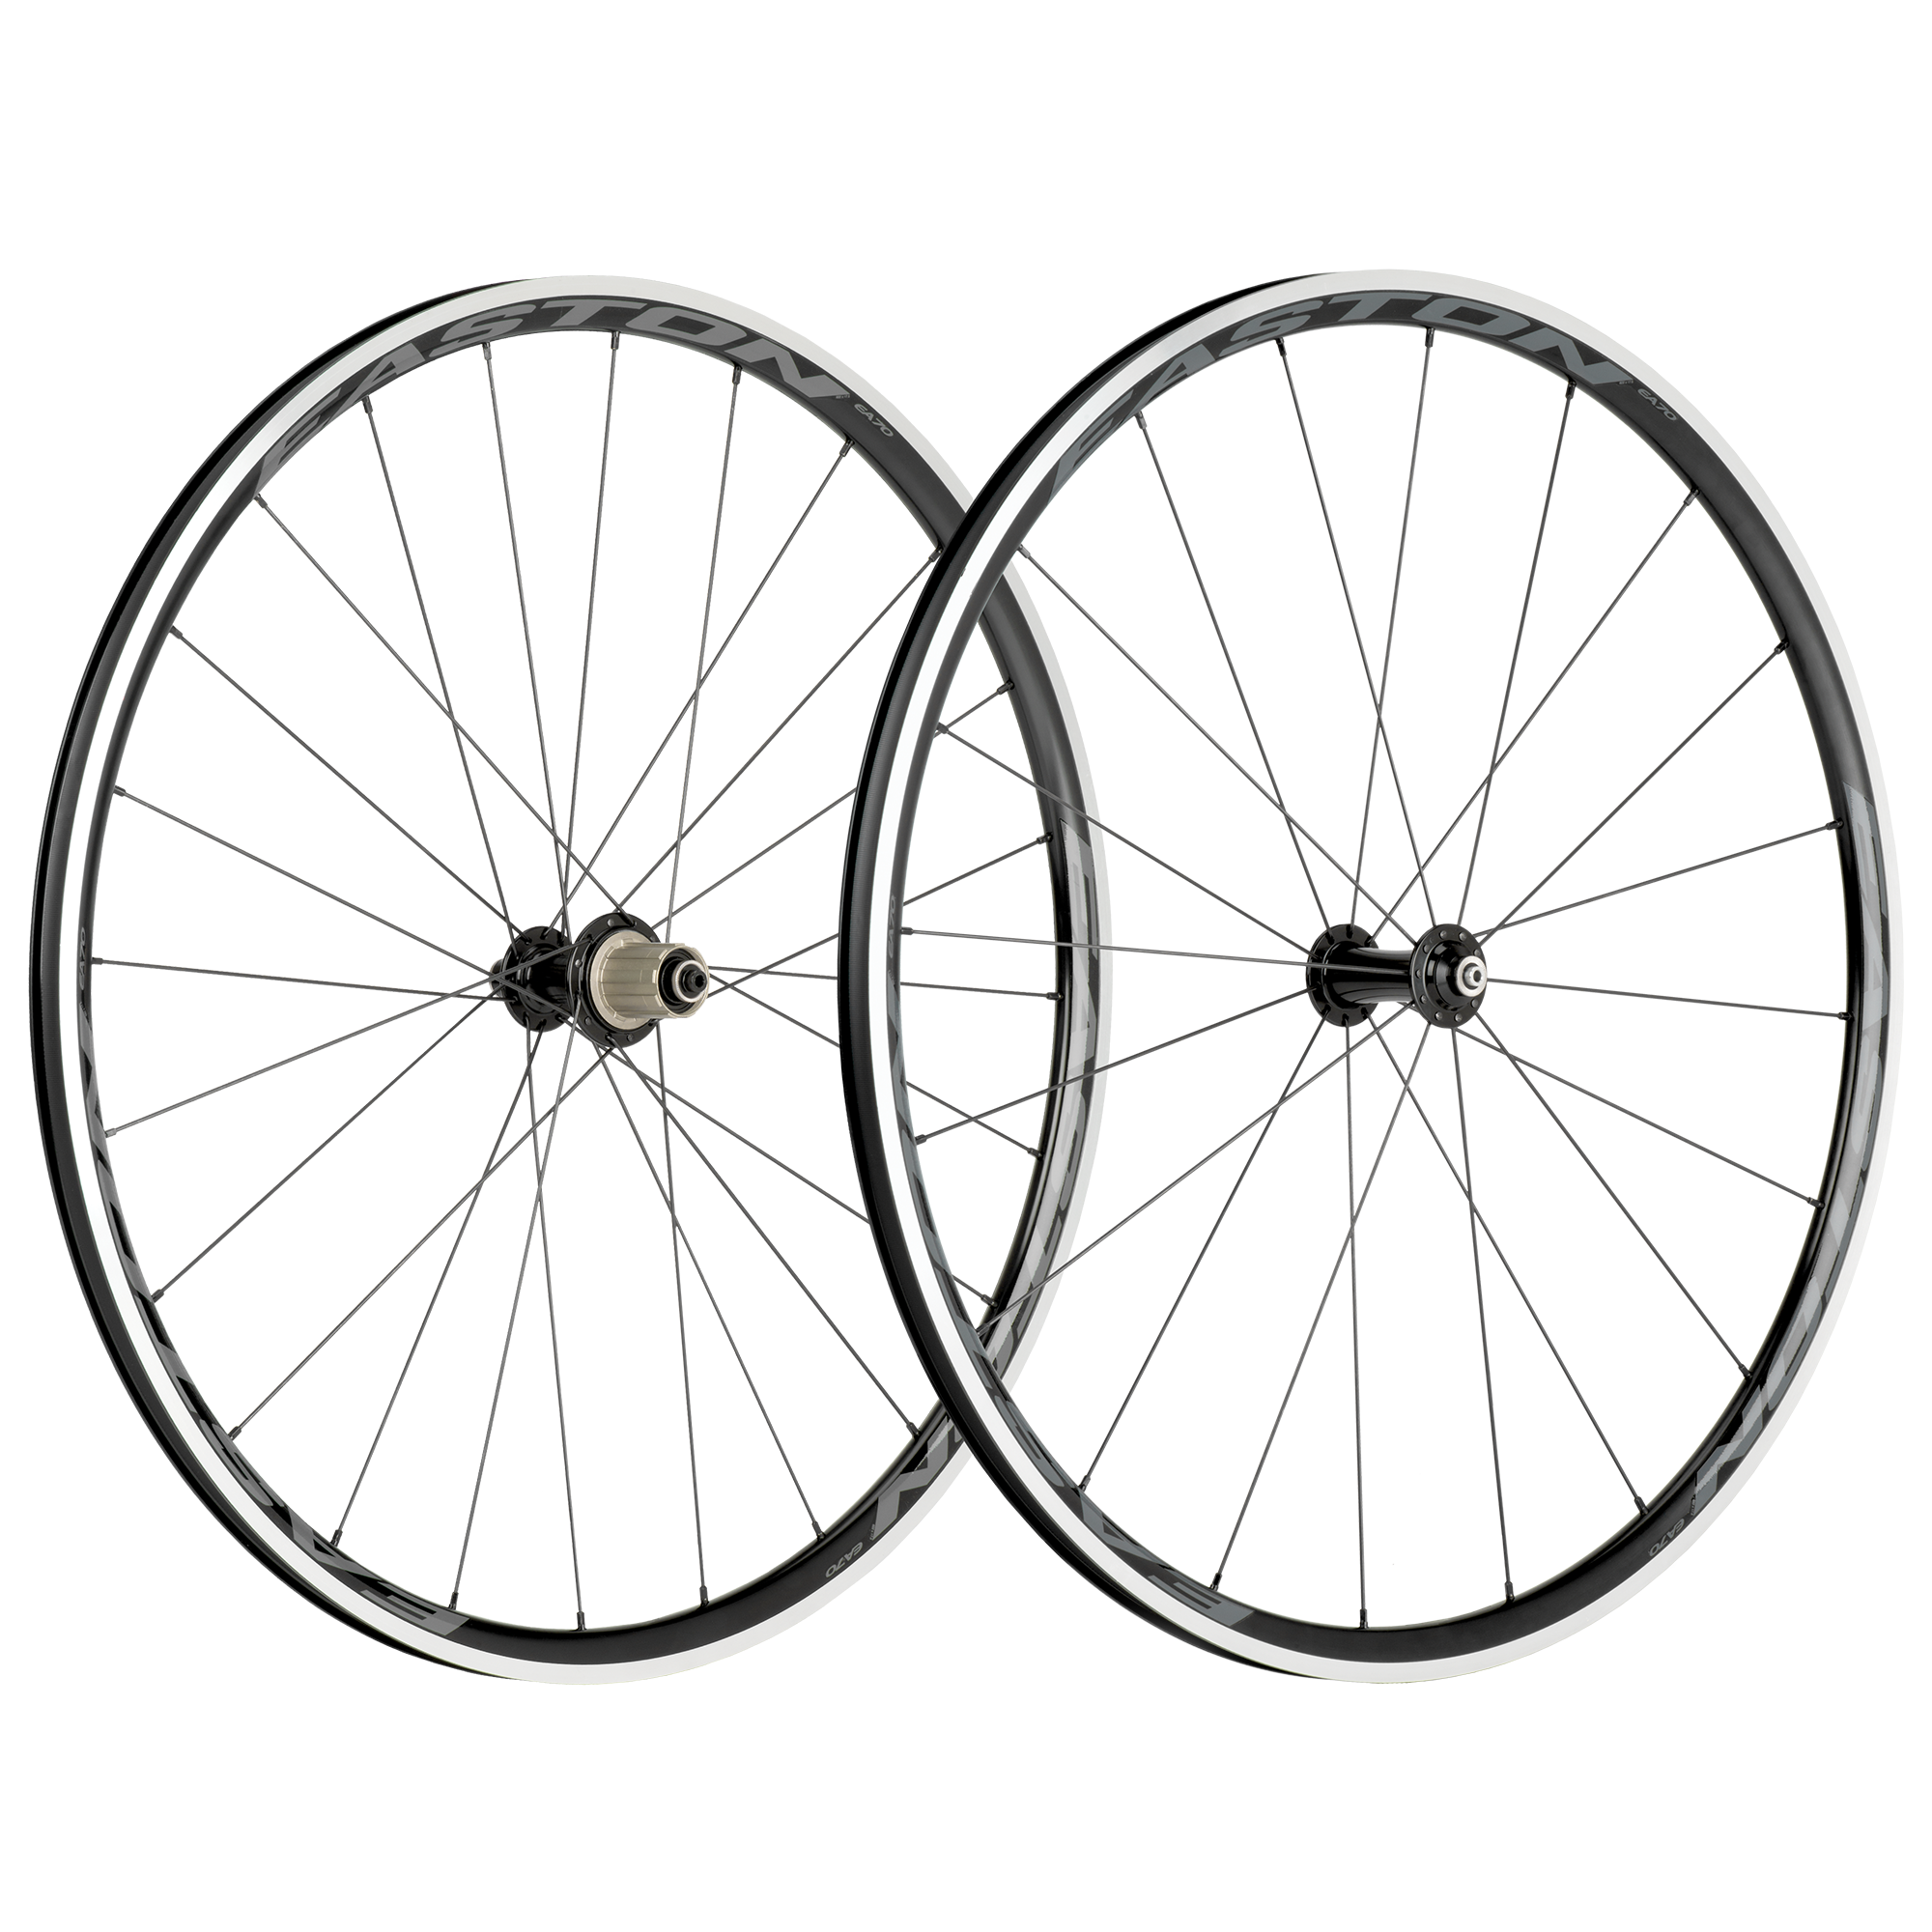 graphic stock Ea easton cycling. Drawing hub wheel